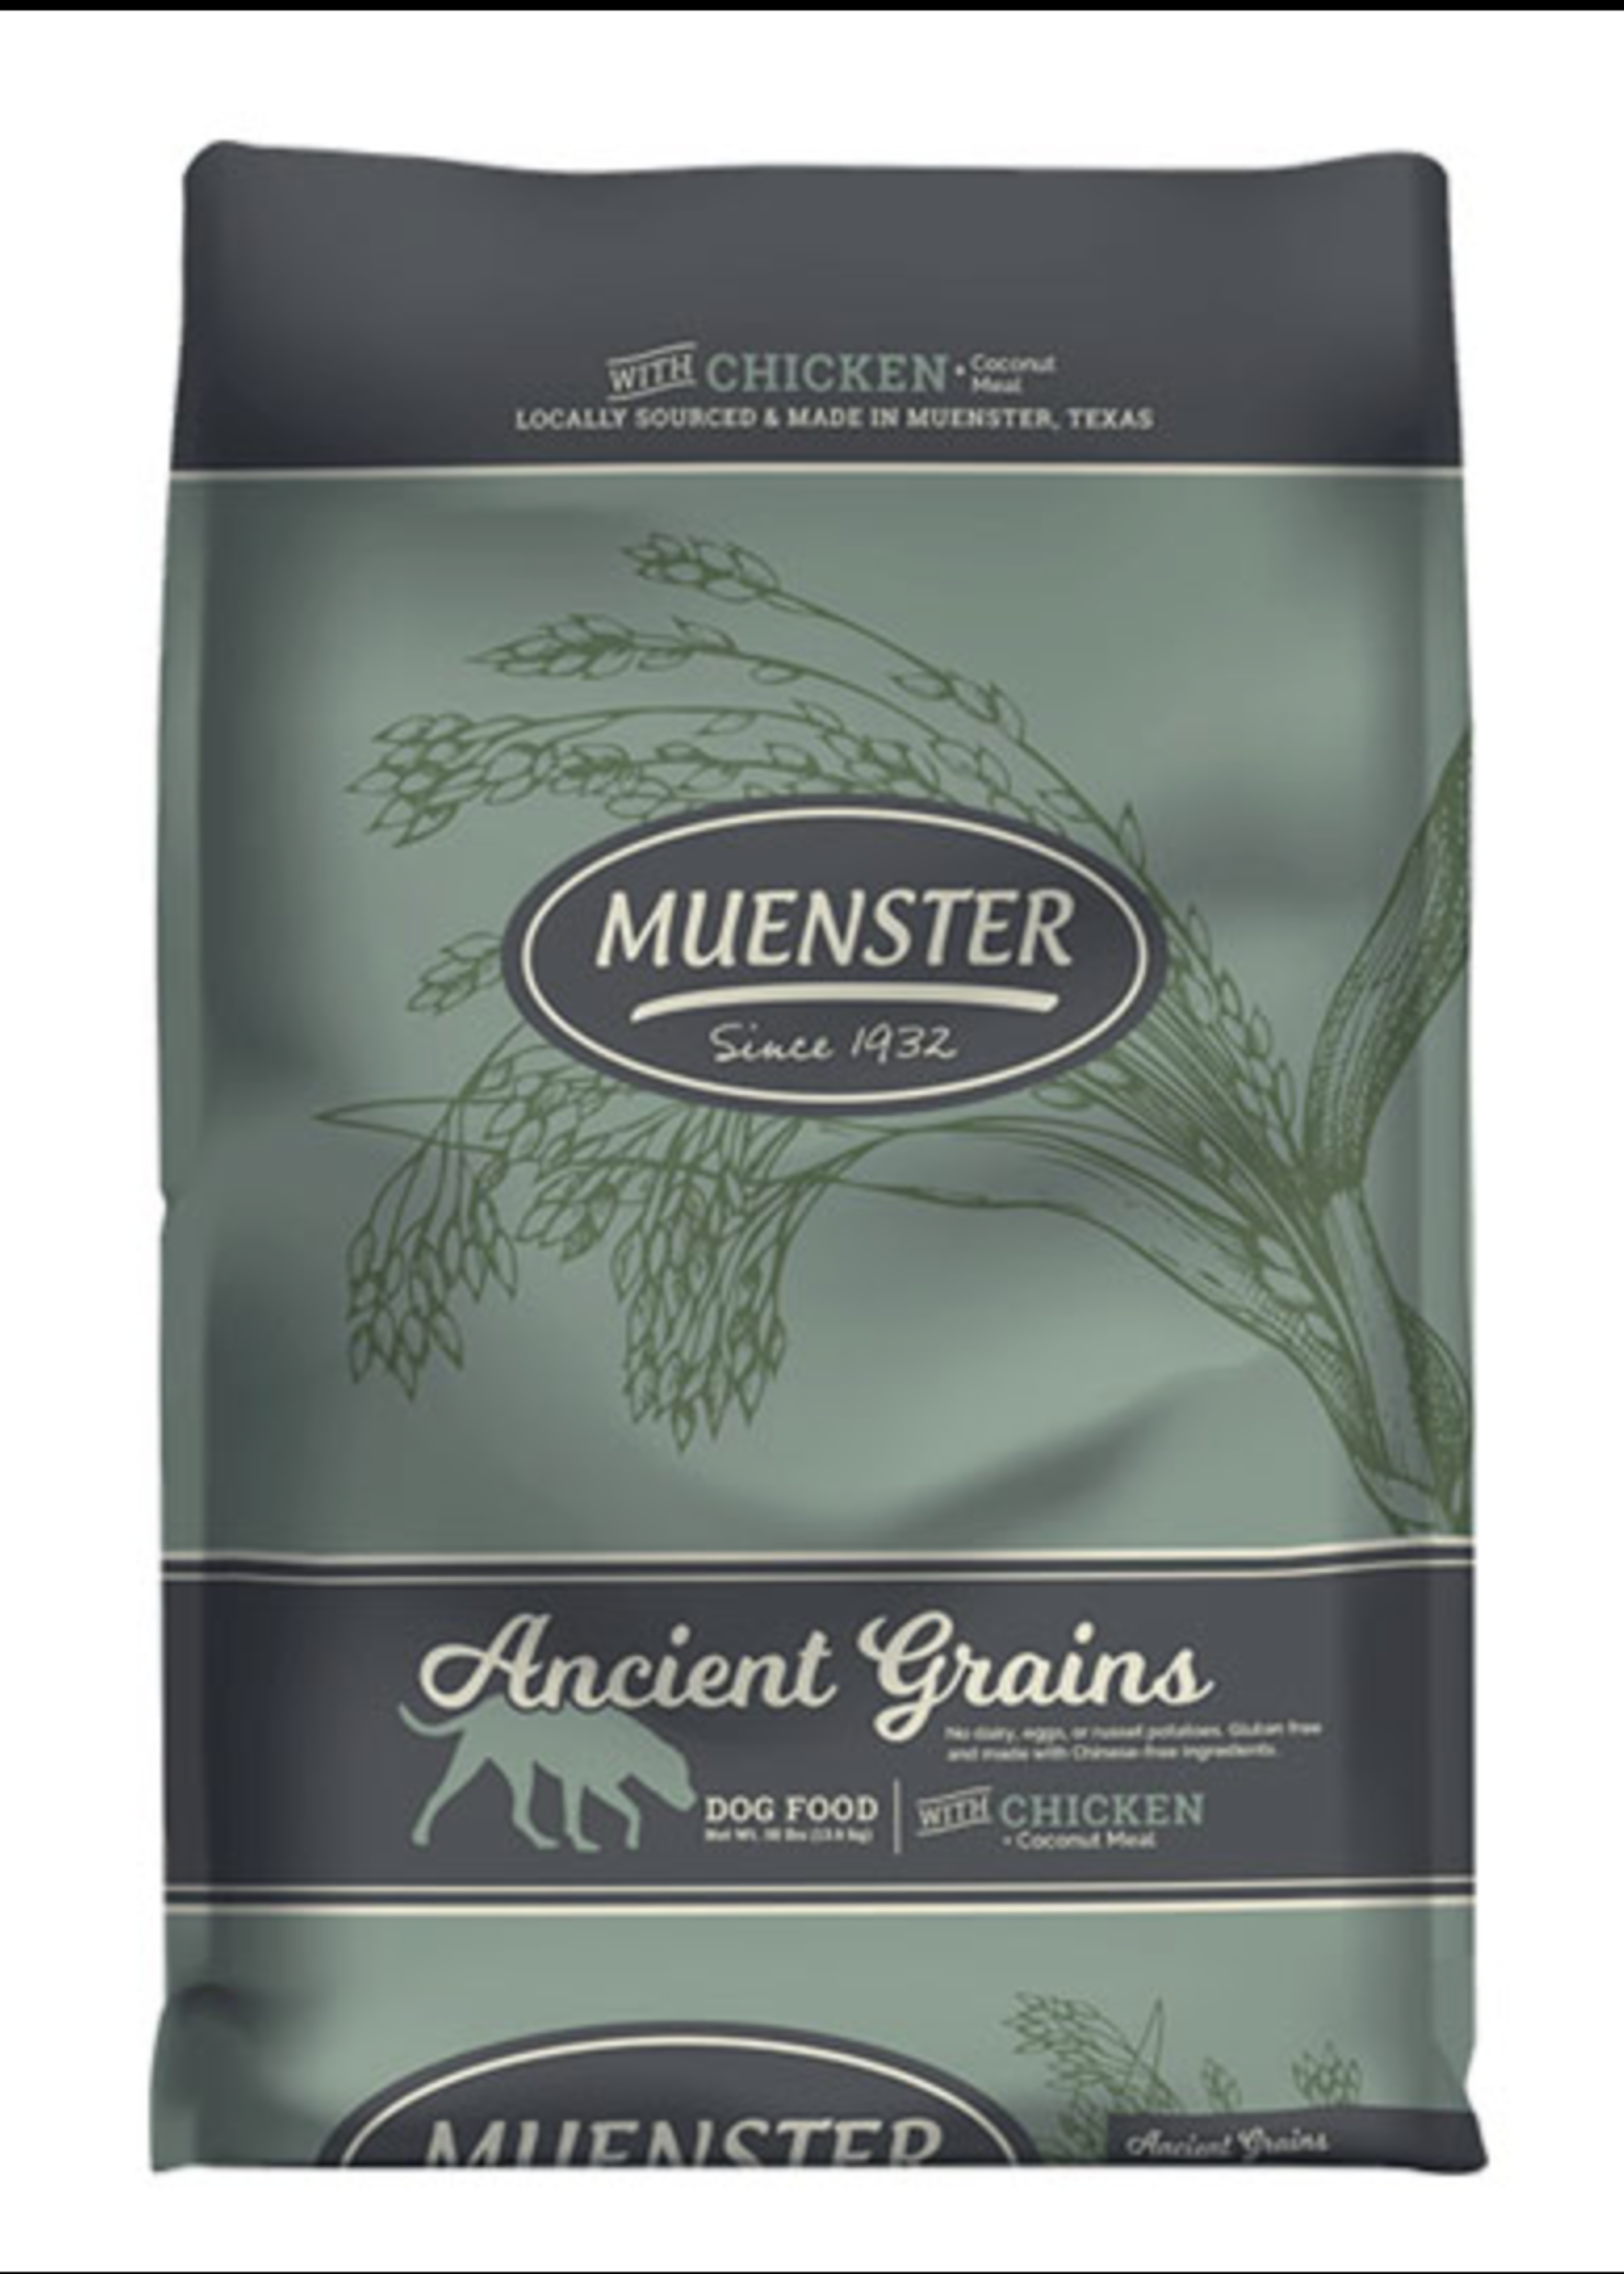 Muenster Milling Co Muenster Ancient Grains Chicken 30lbs